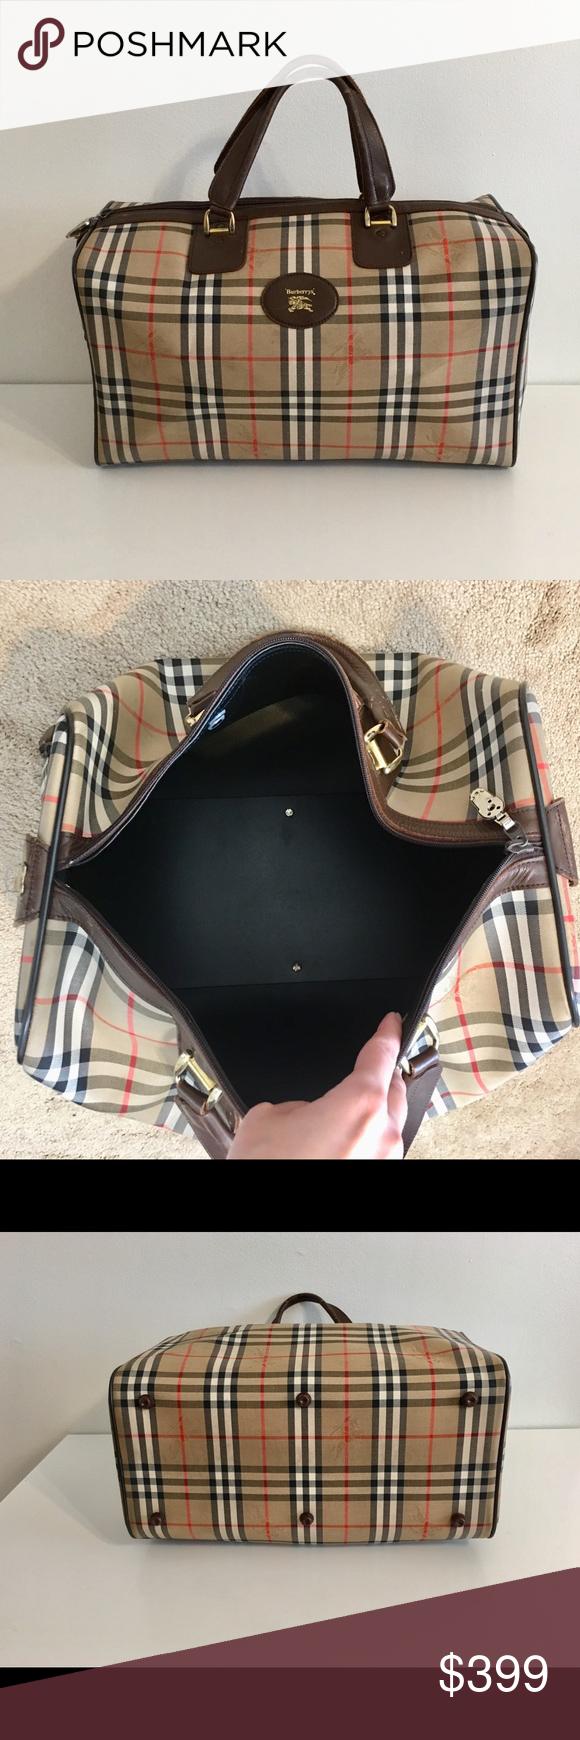 Authentic Burberry travel bag Authentic Burberrys unisex travel bag.  Classic nova check canvas w brown 8db82e2417d0b